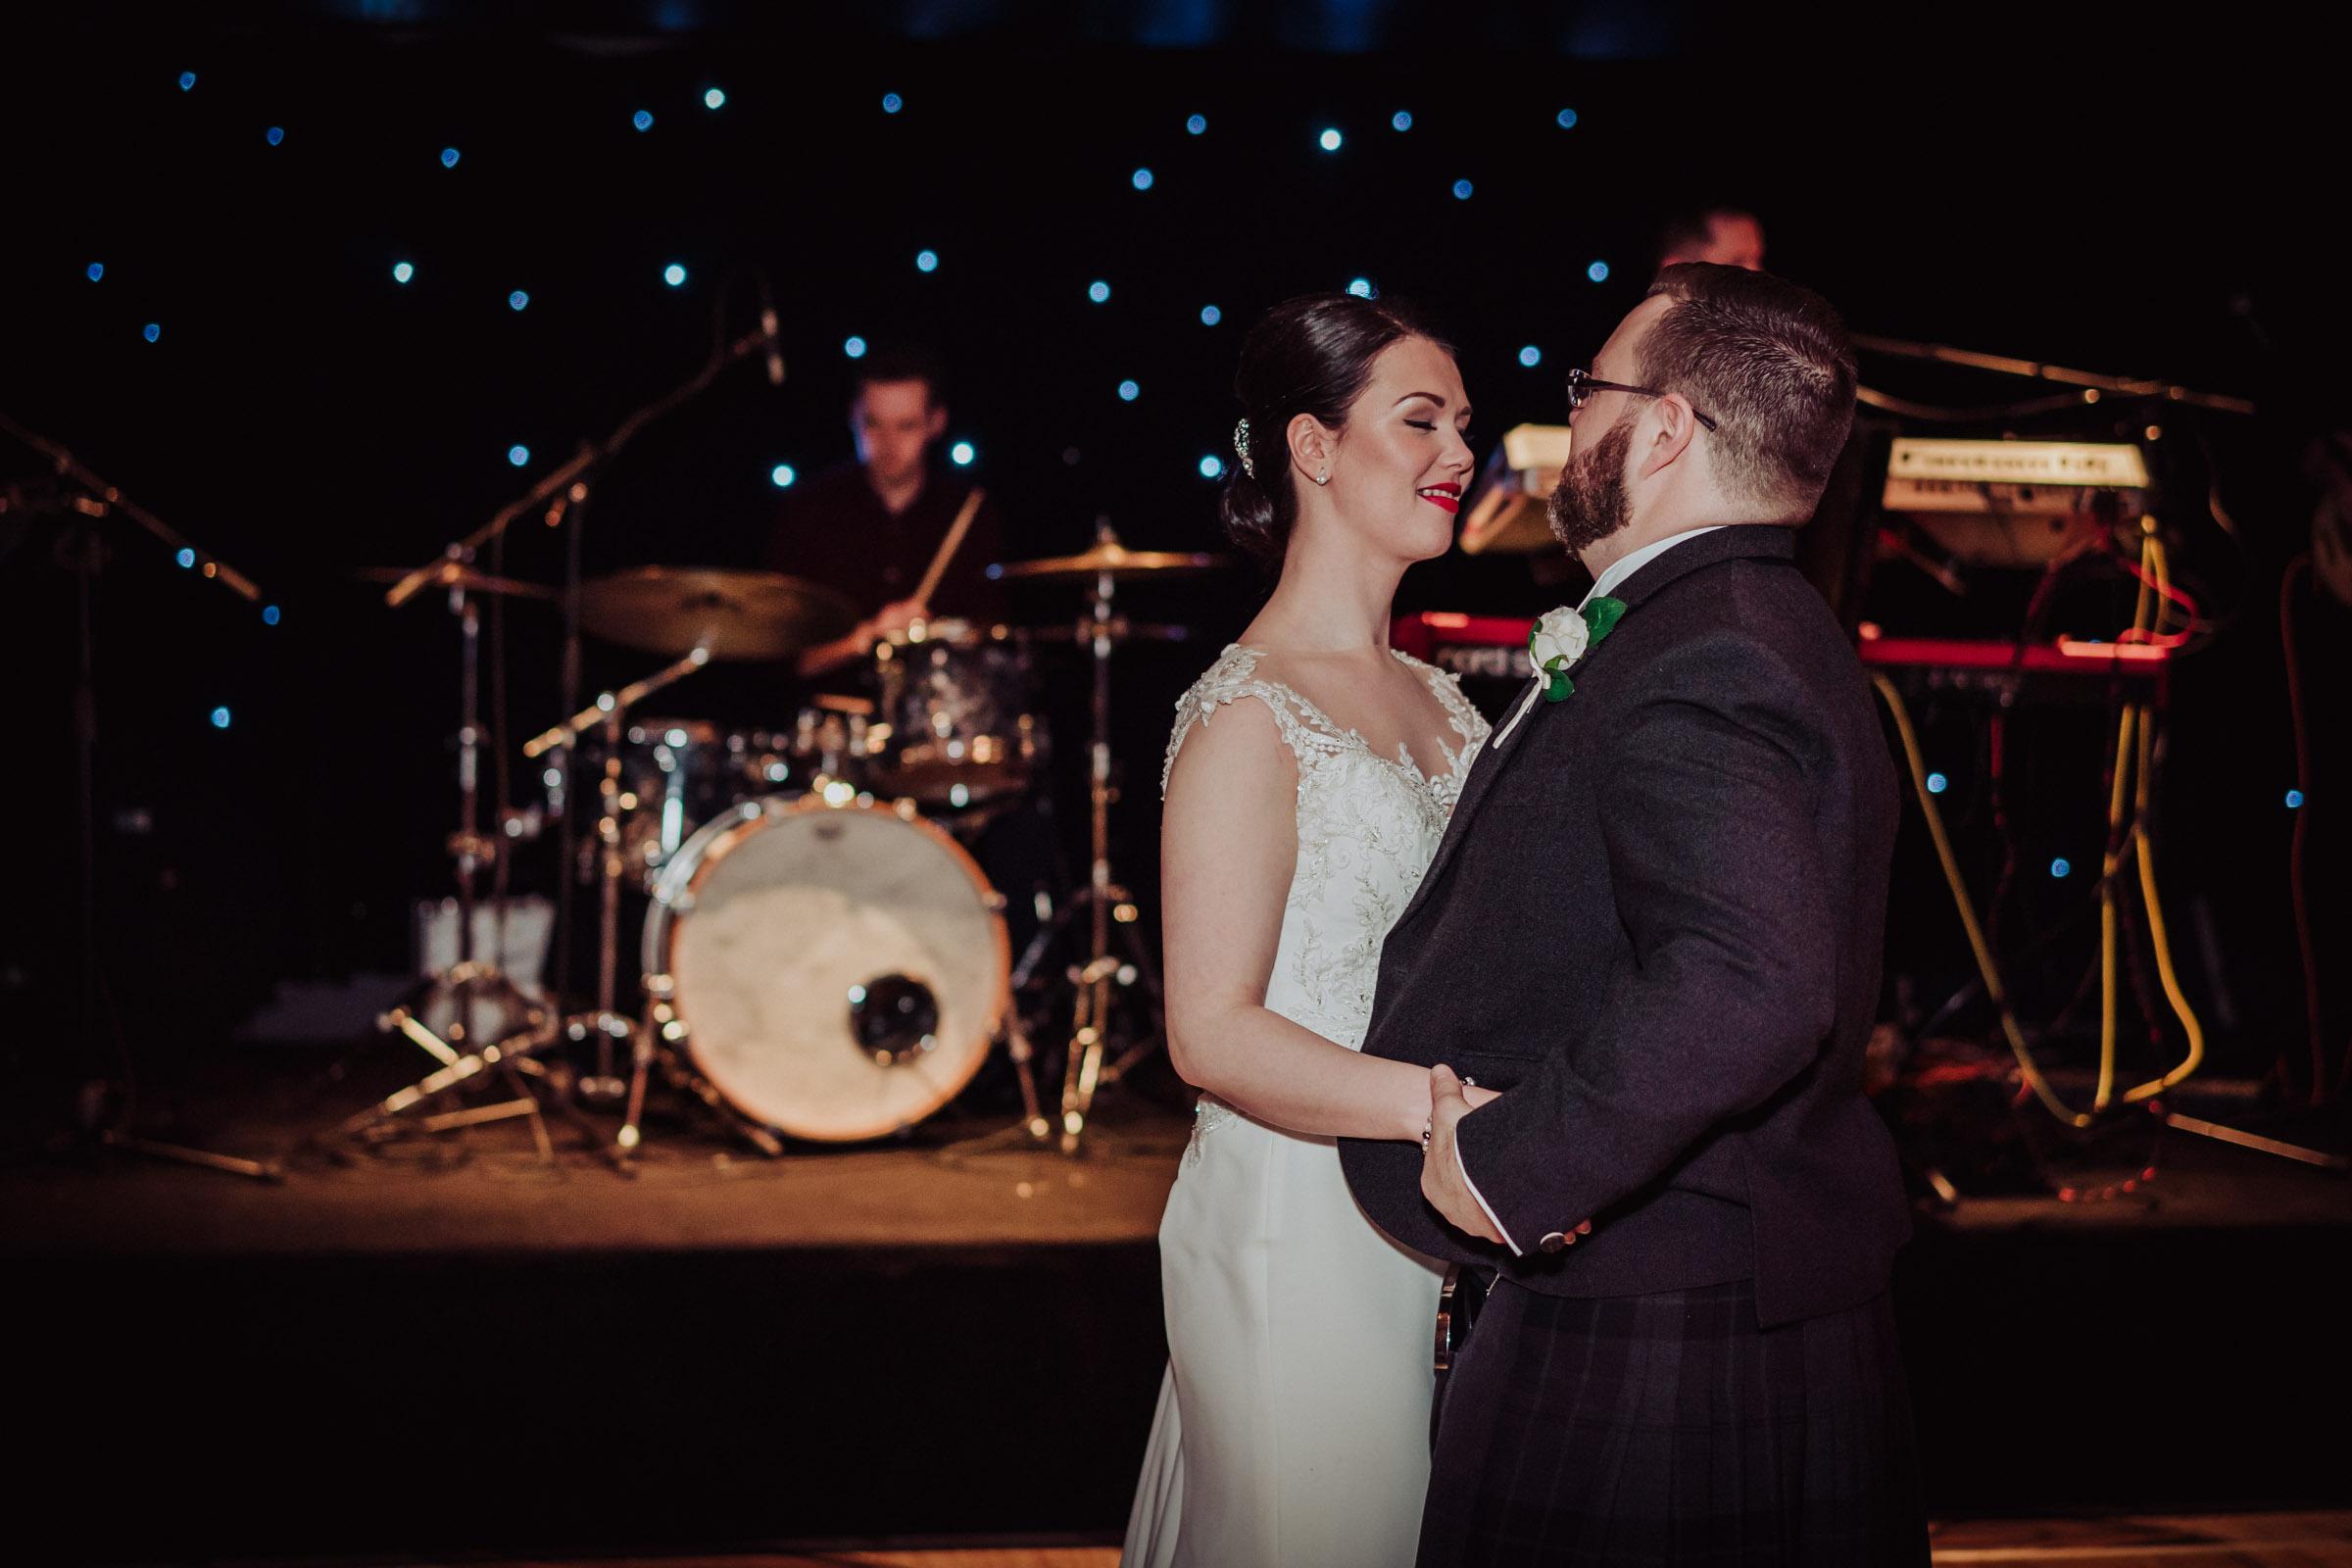 Radstone-Wedding-Dearly-Photography-Scotland (44 of 50).jpg